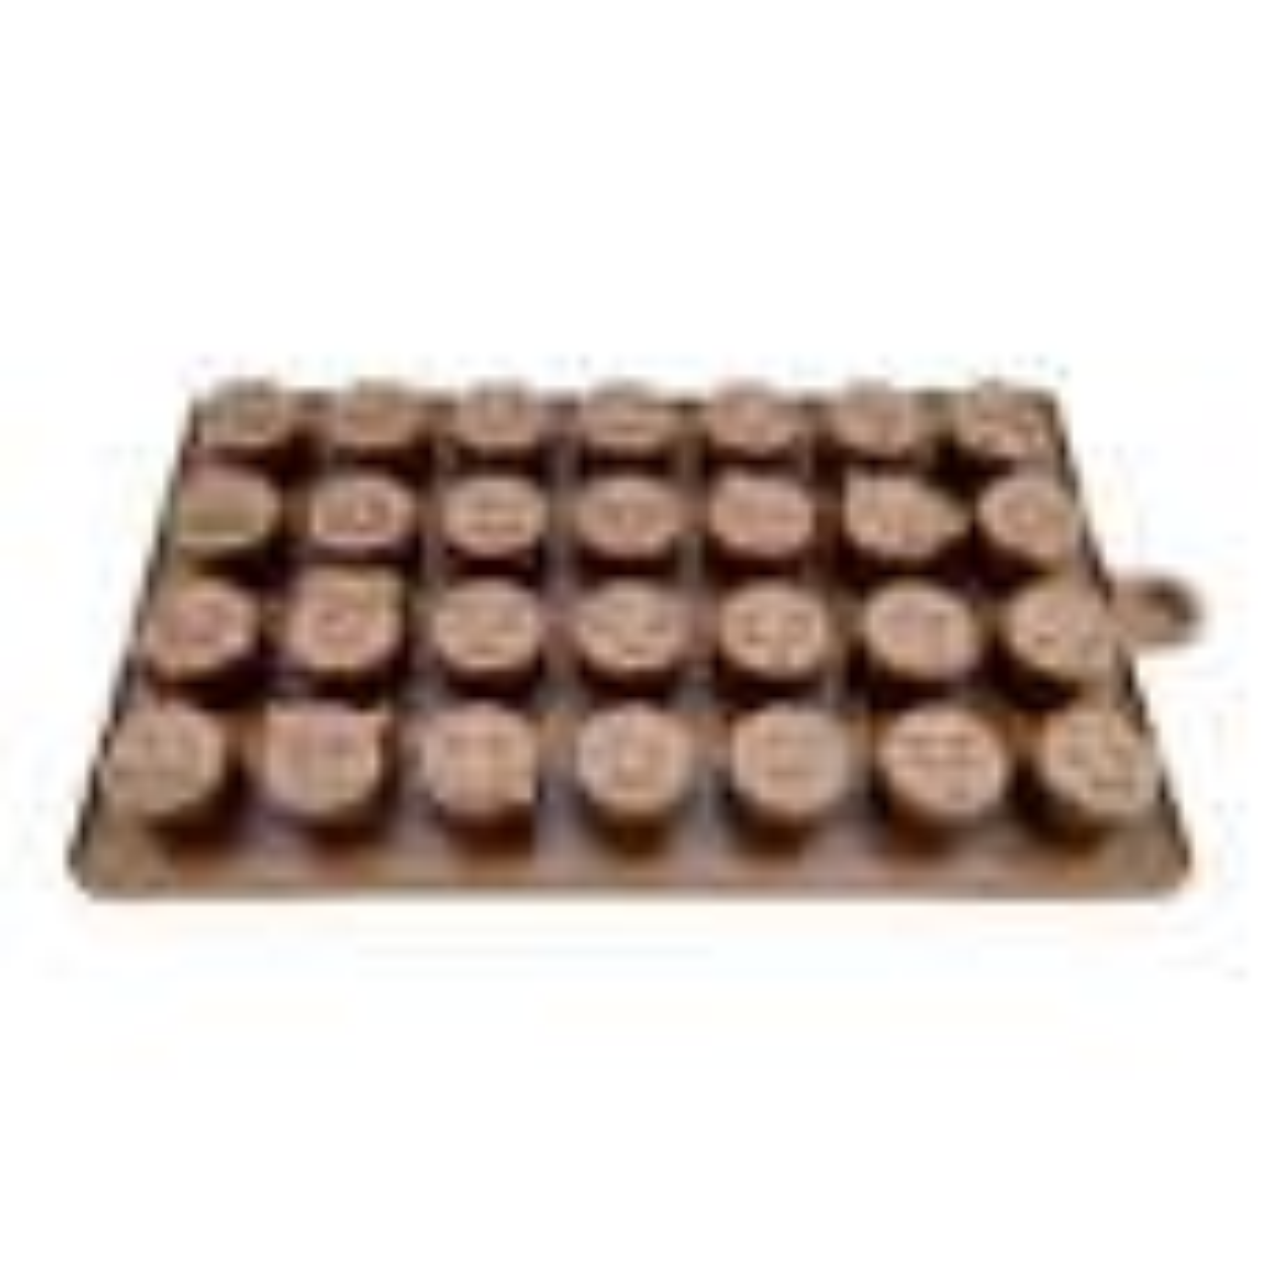 قالب شکلات طرح ایموجی کد 733 thumb 1